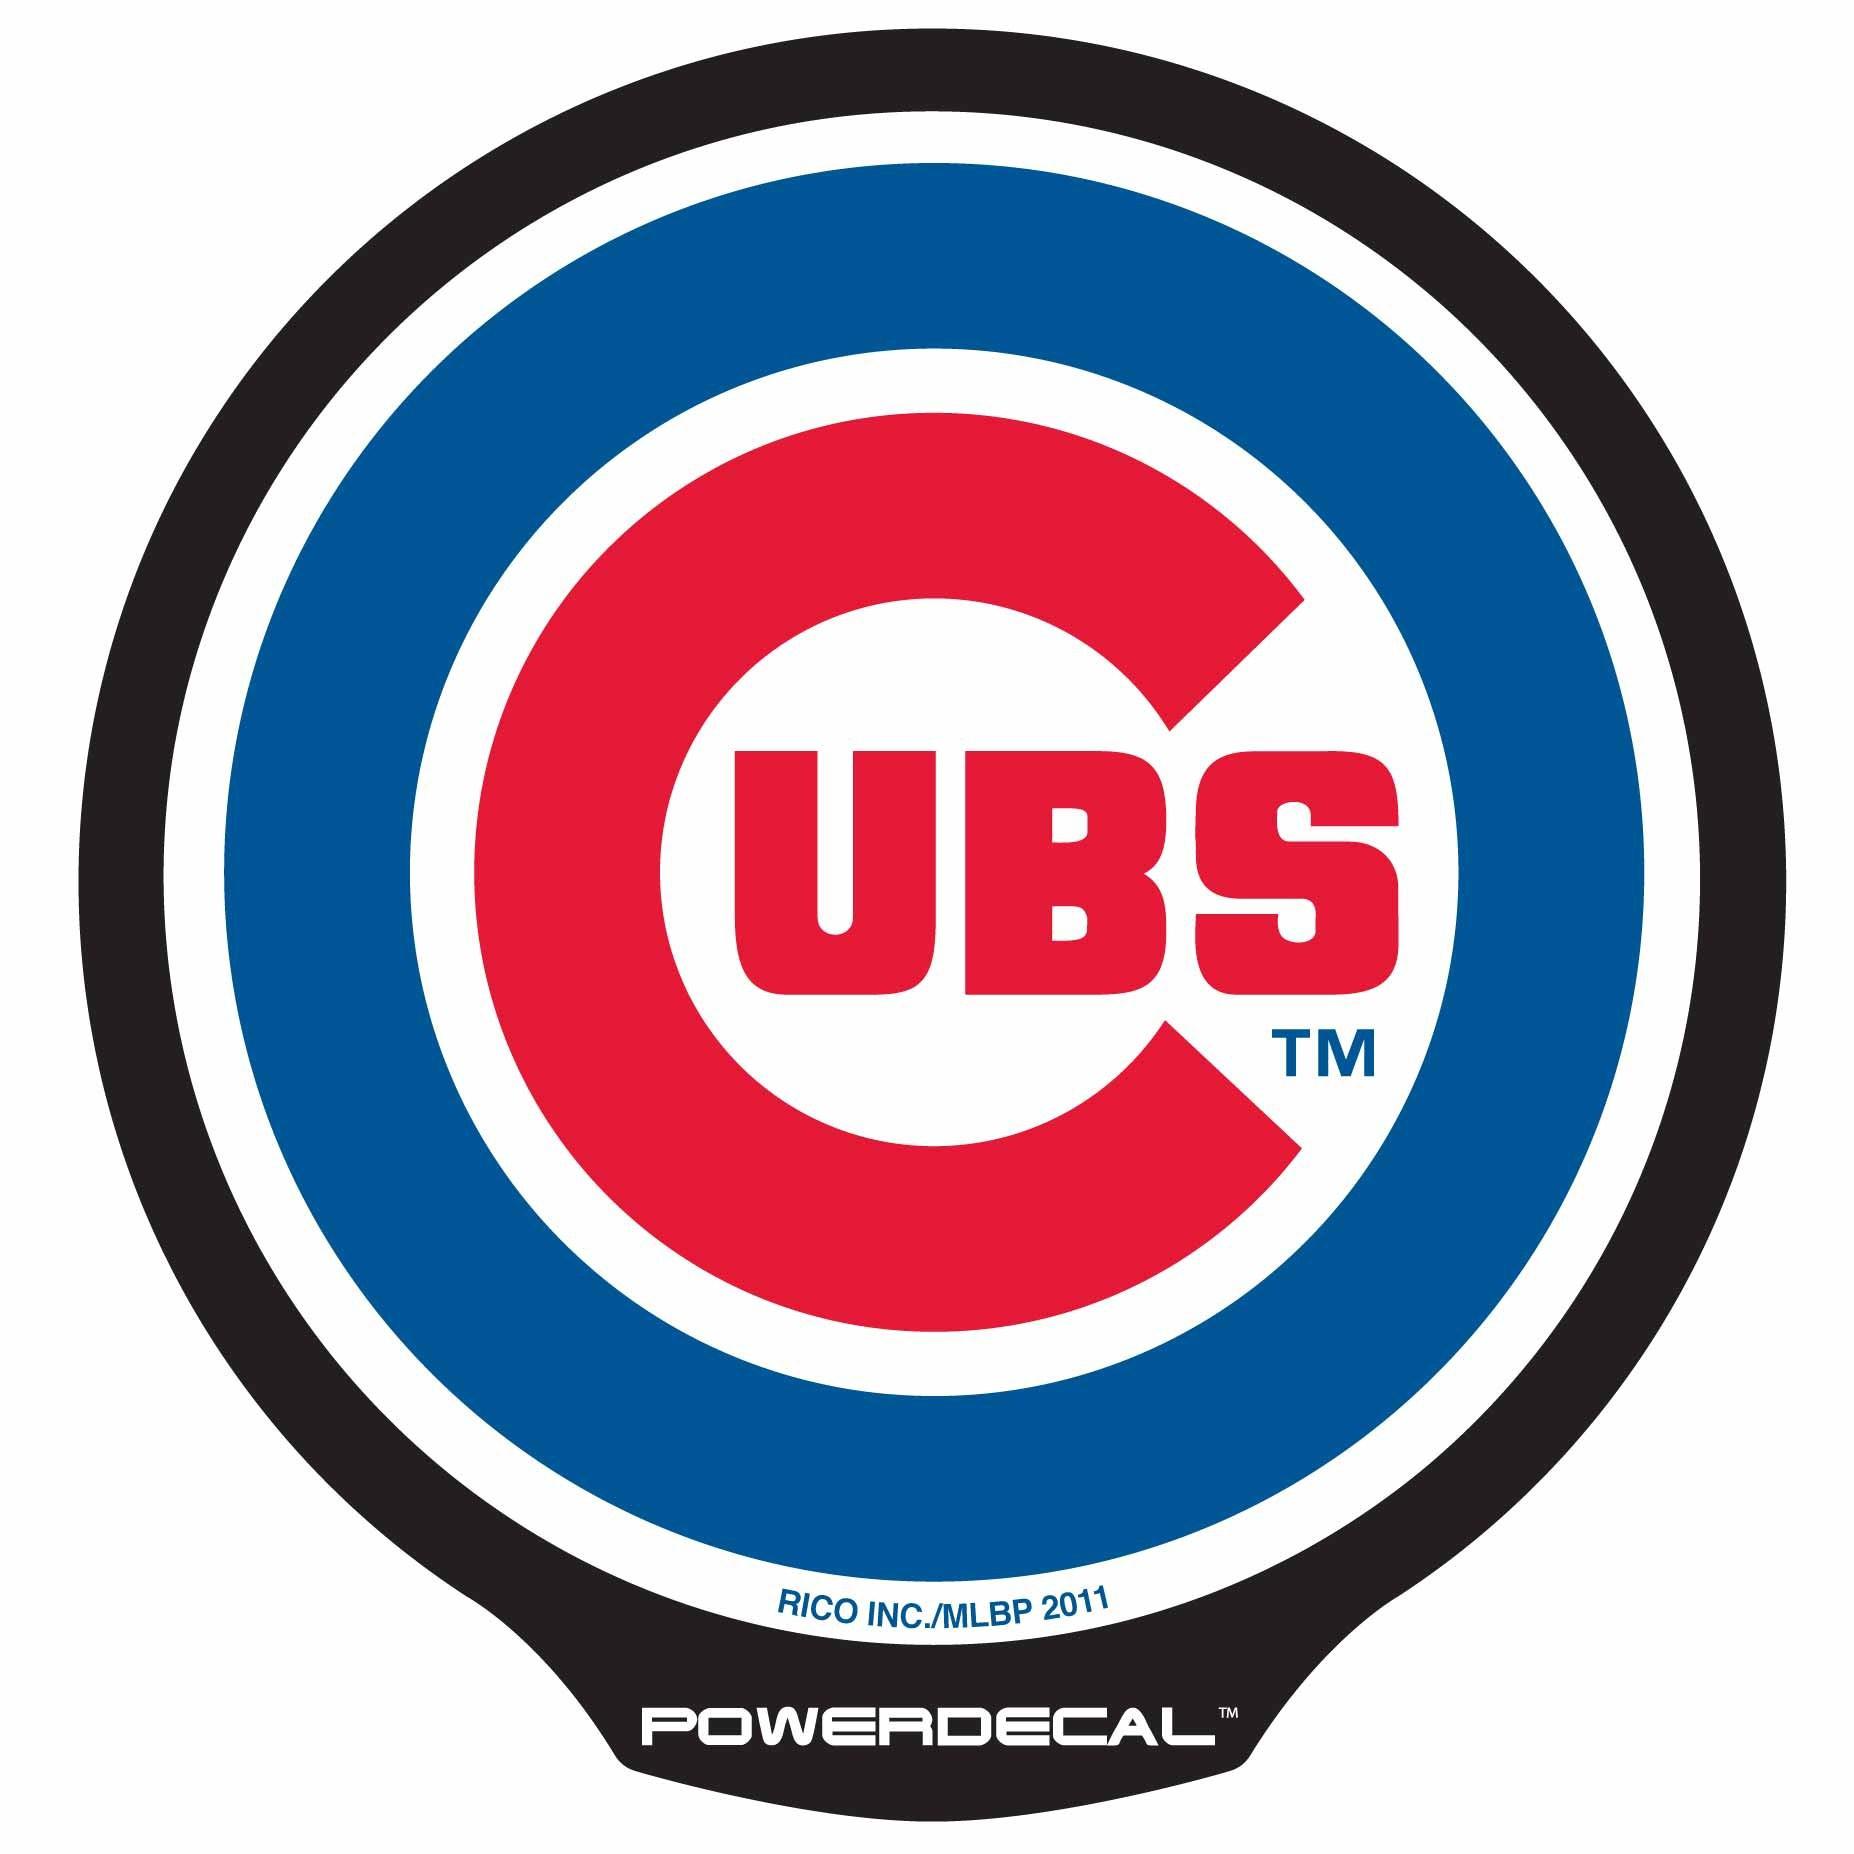 1854x1854 Chicago Bears Logo Clip Art